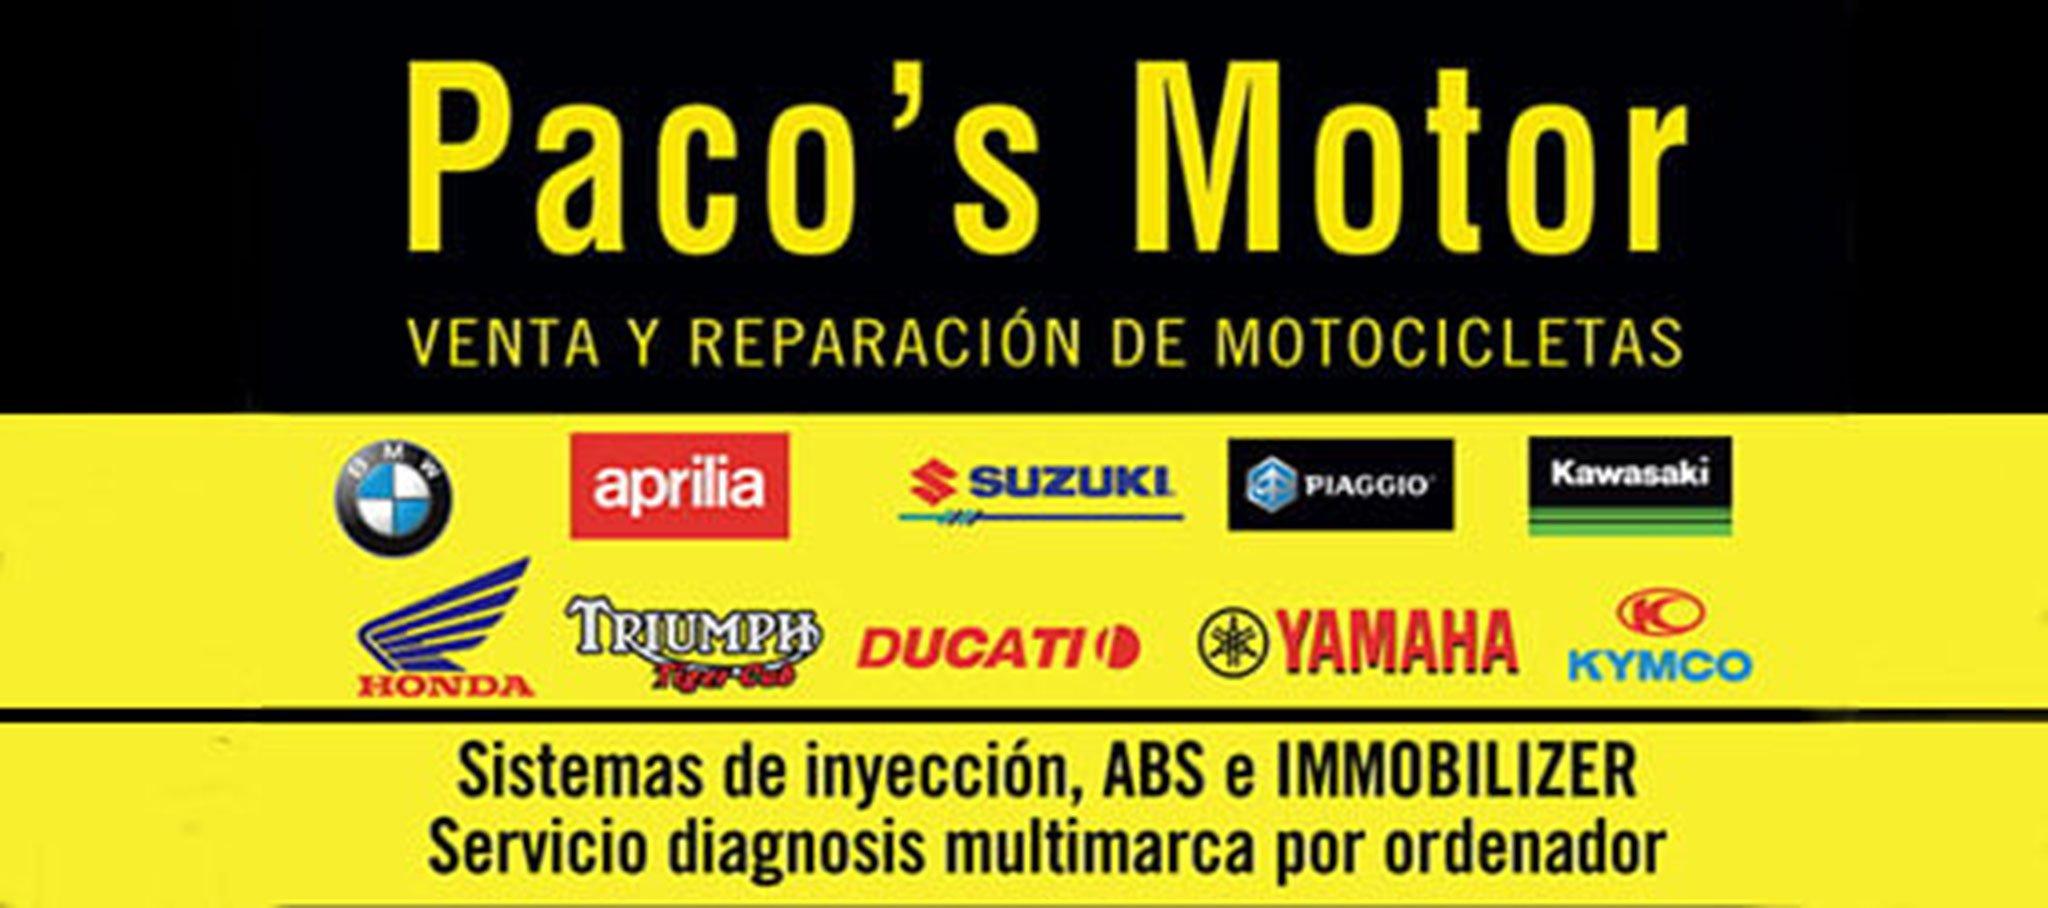 Logotipo de Paco's Motor